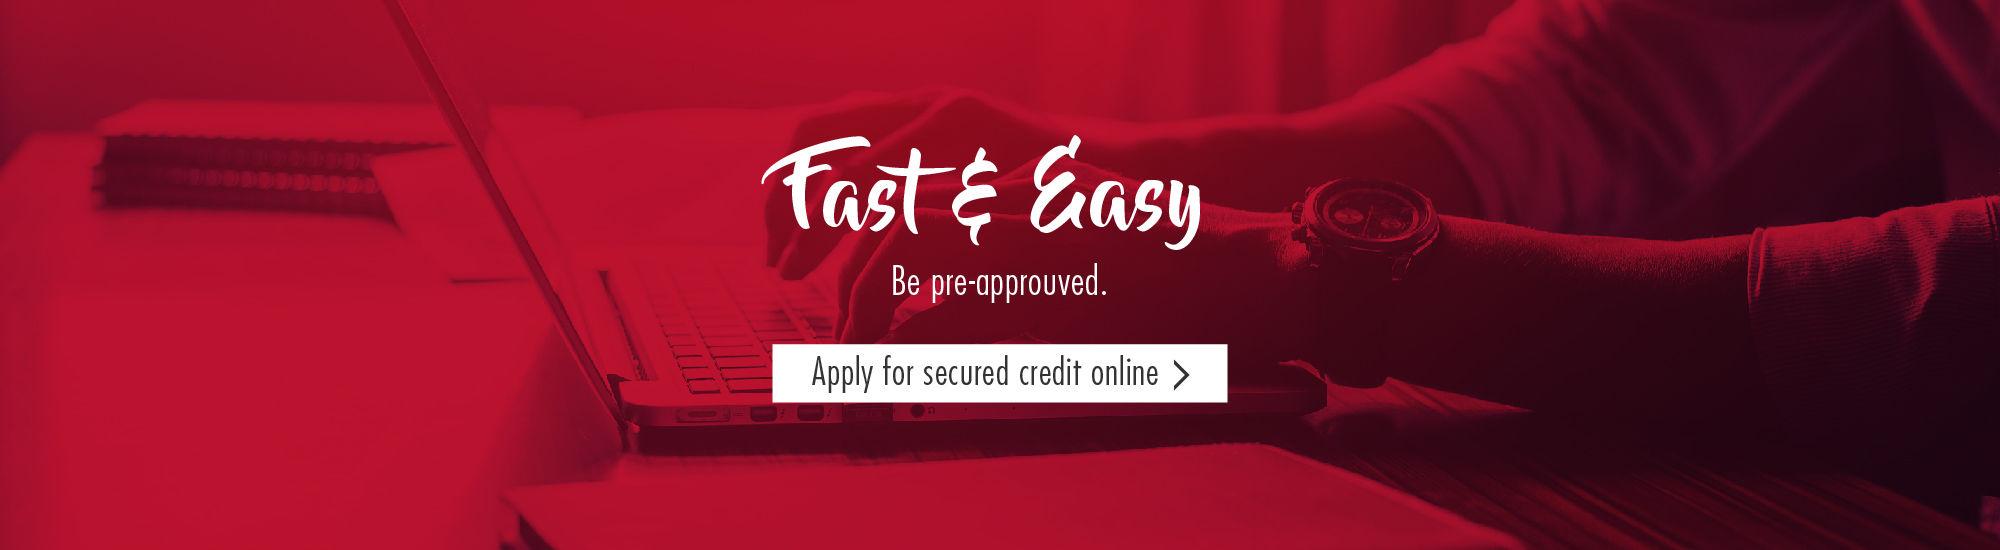 Apply for secured credit online